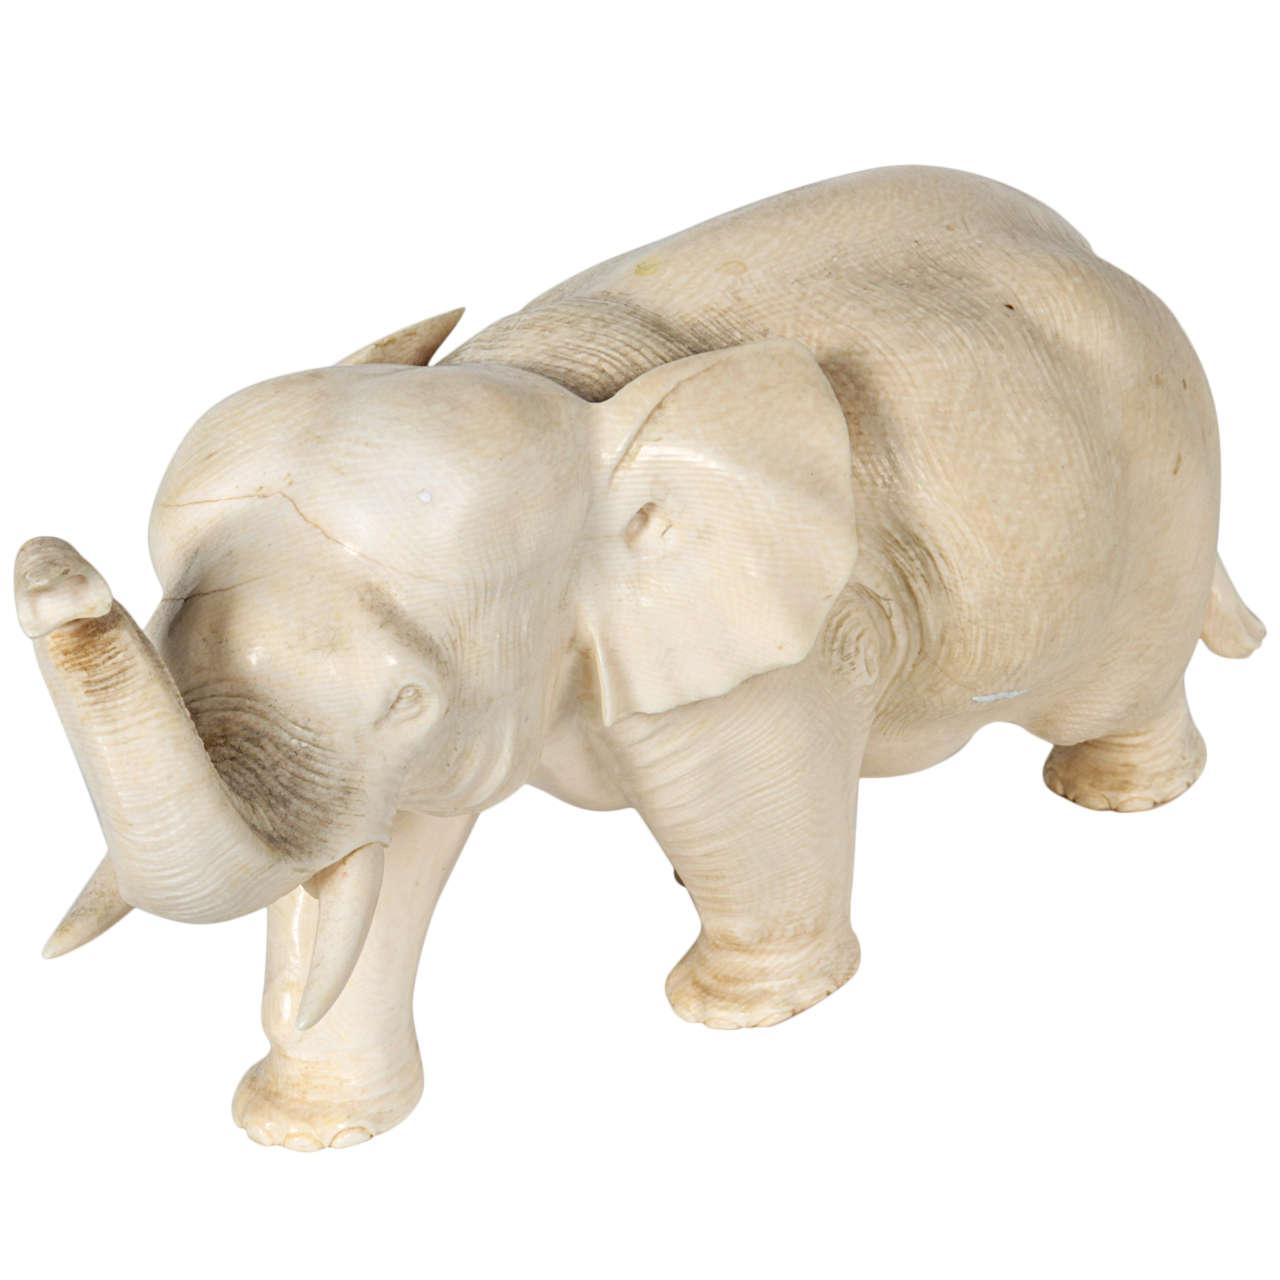 Japanese Meiji Period Artist Signed Carved Ivory Elephant